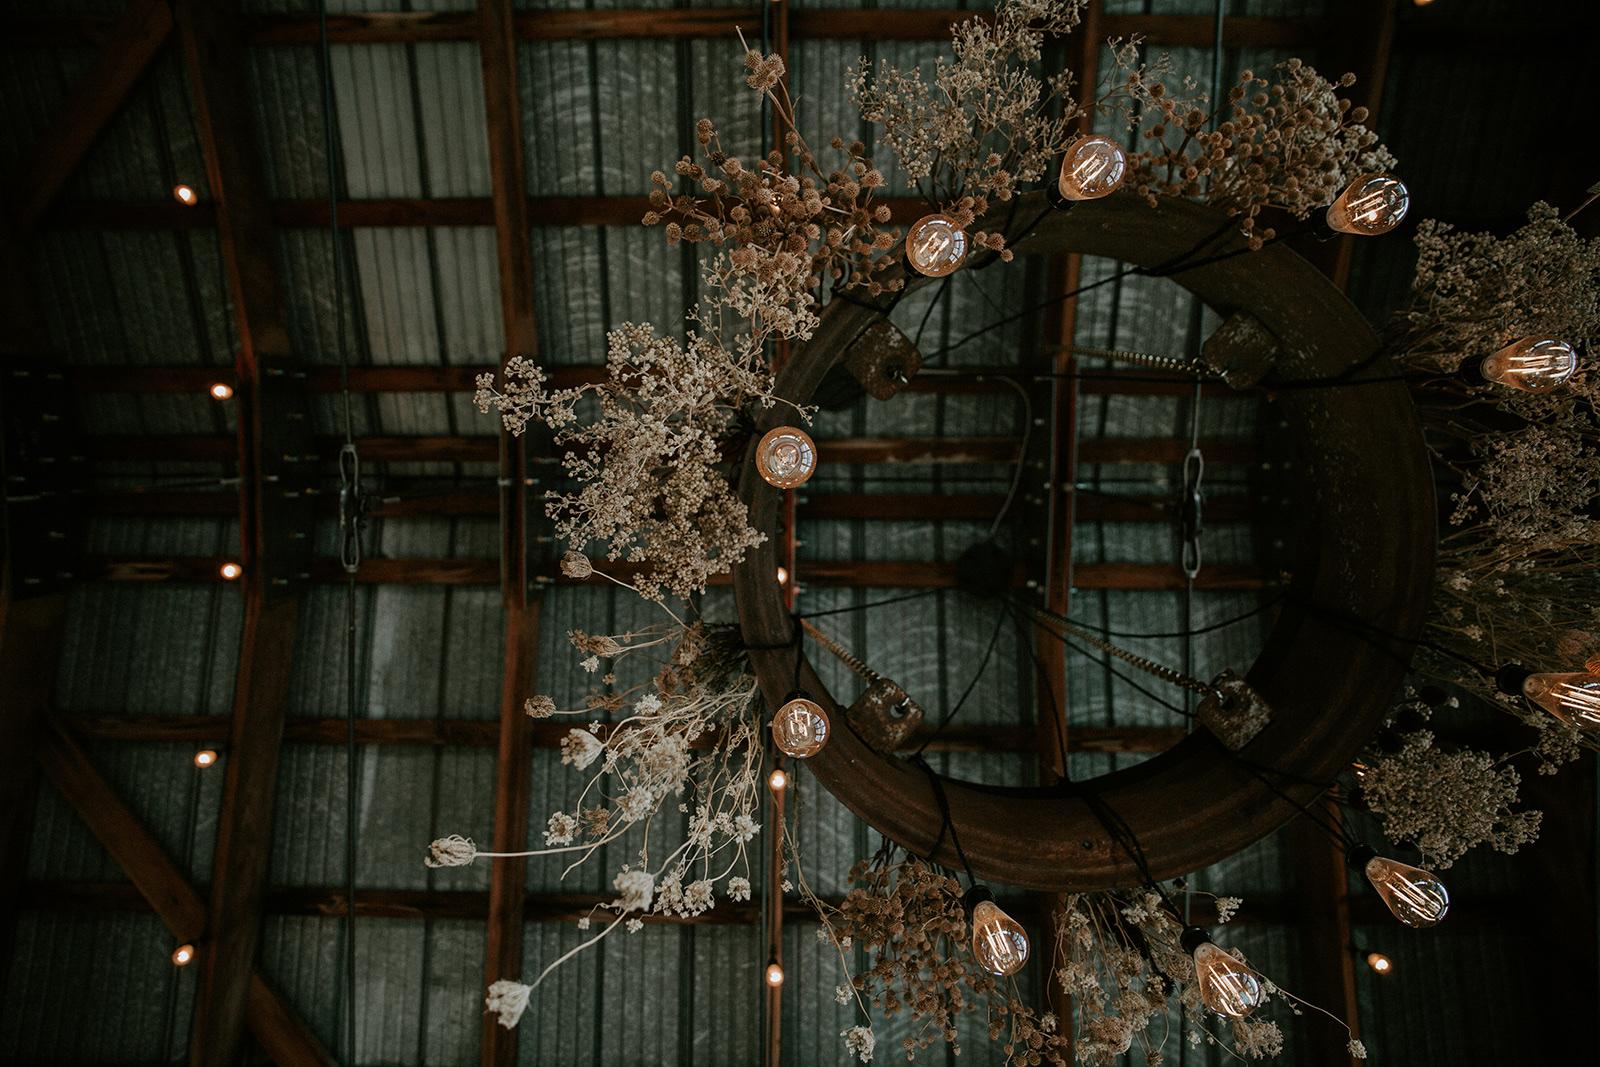 bluestem_hall_champaign_wedding_photographer_wright_photographs_collaboration_0221.jpg